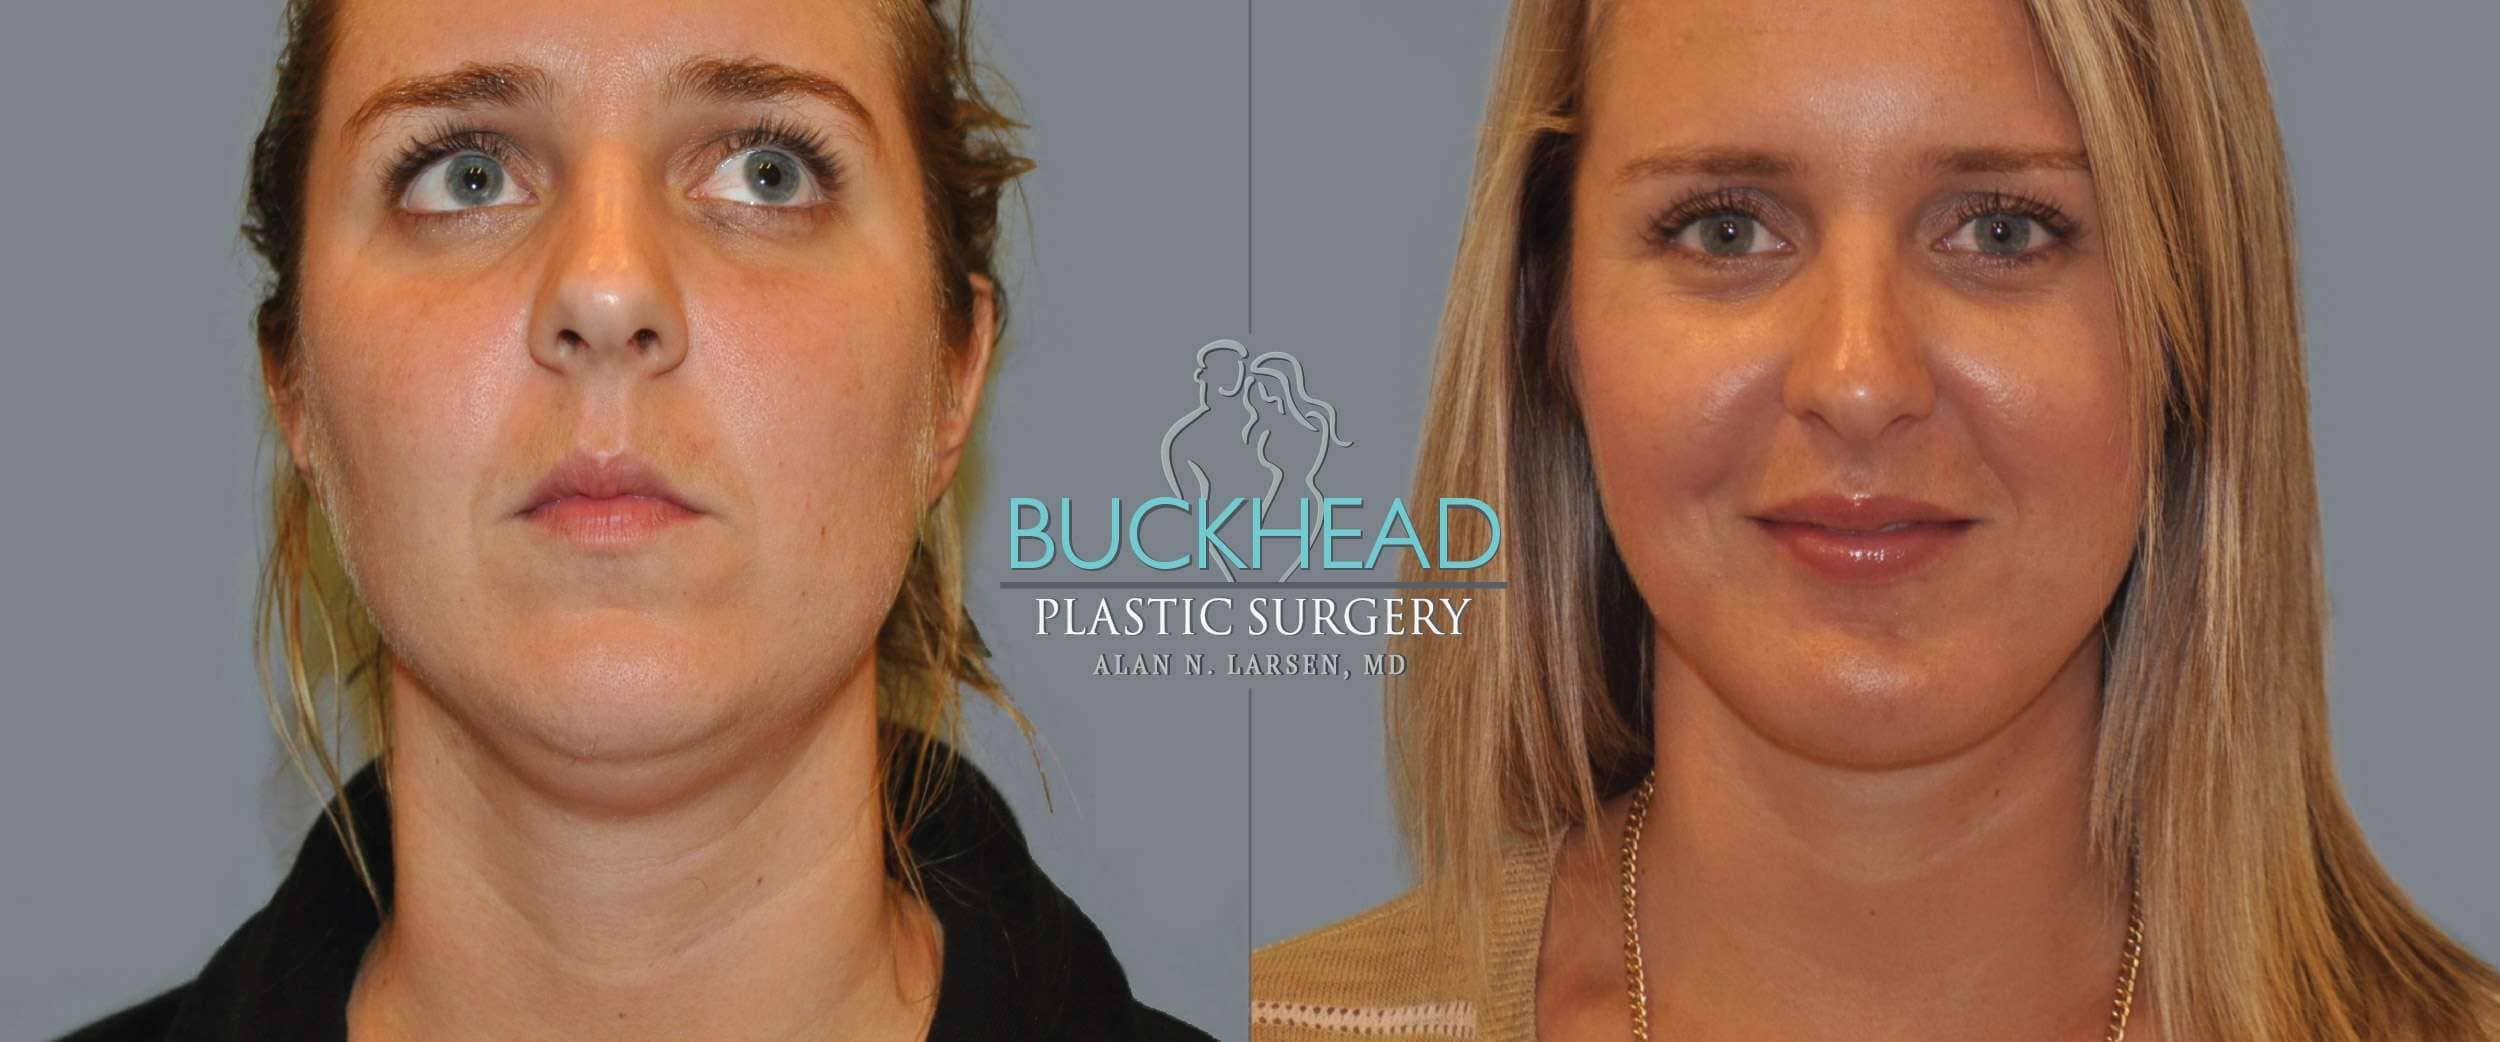 Before and After Photo Gallery | Liposuction - Neck | Buckhead Plastic Surgery | Alan N. Larsen, MD | Board-Certified Plastic Surgeon | Atlanta GA